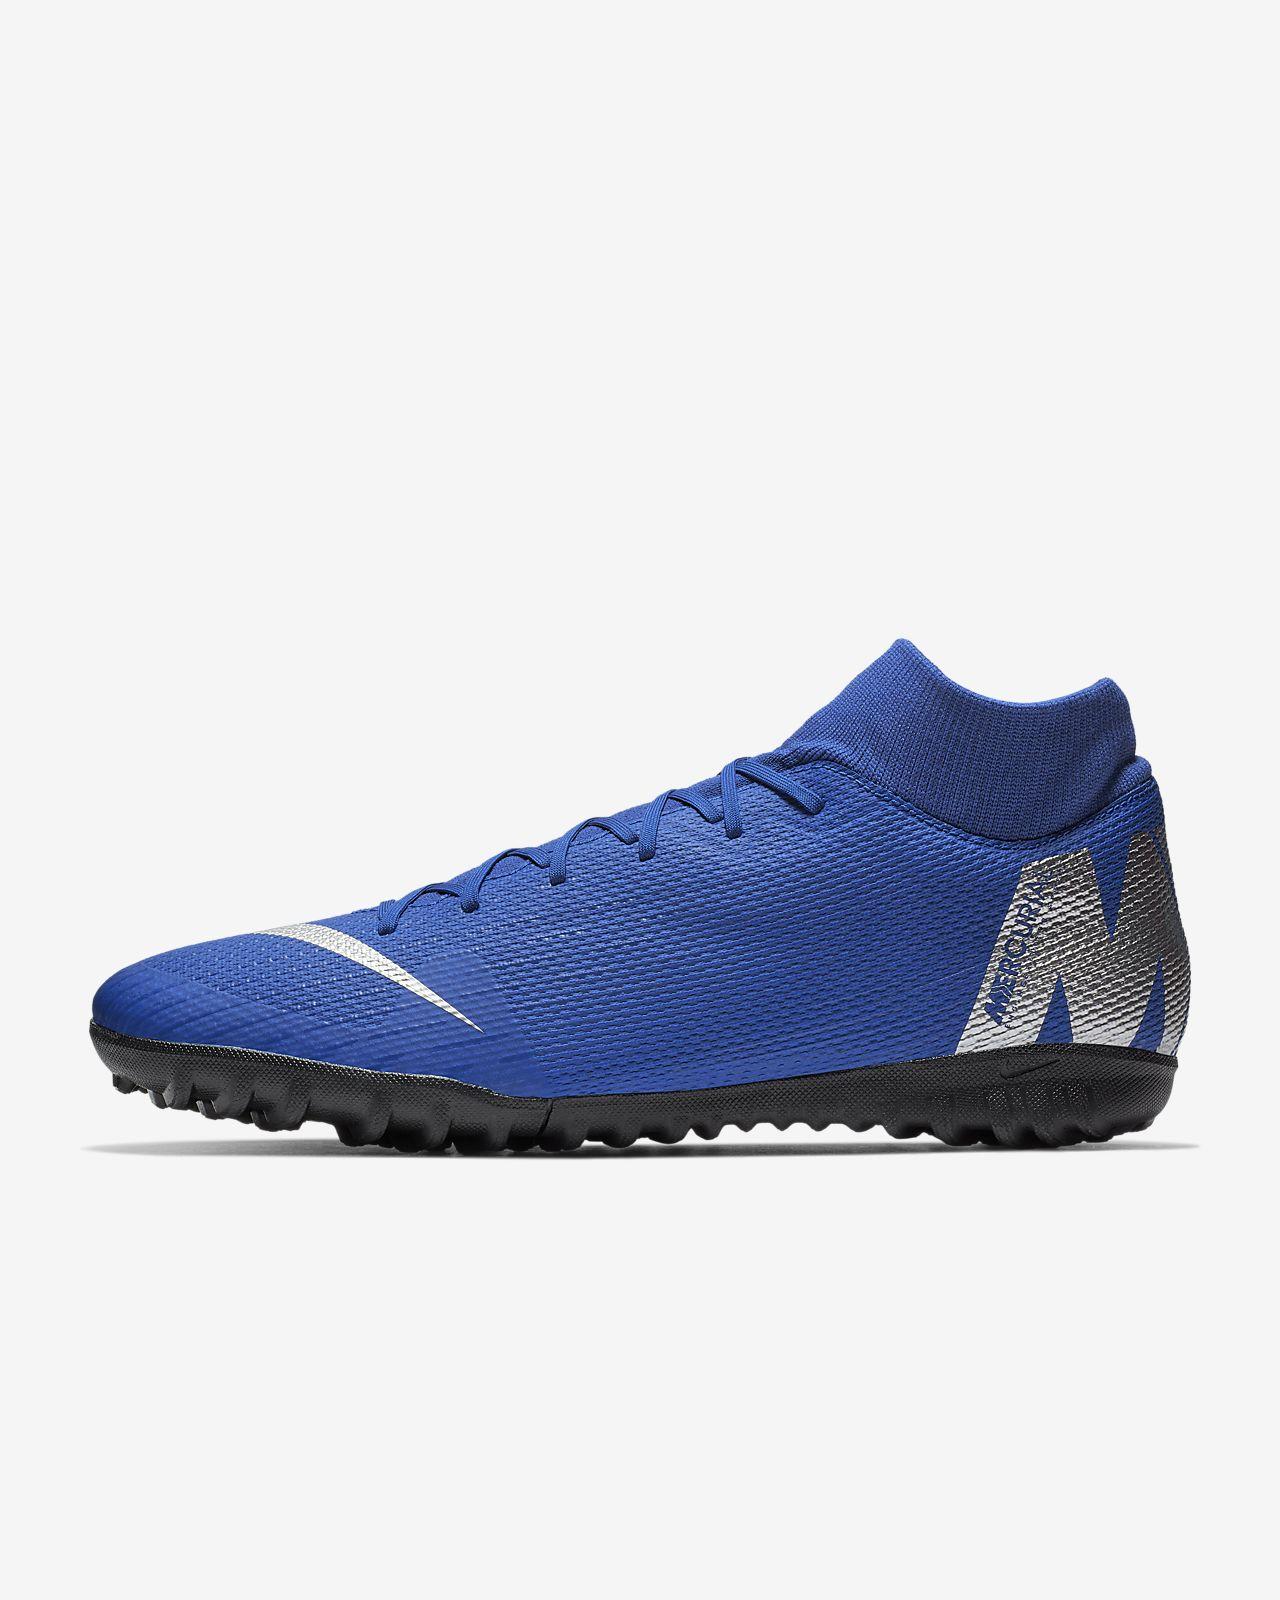 Scarpa da calcio per erba artificiale/sintetica Nike MercurialX Superfly VI Academy